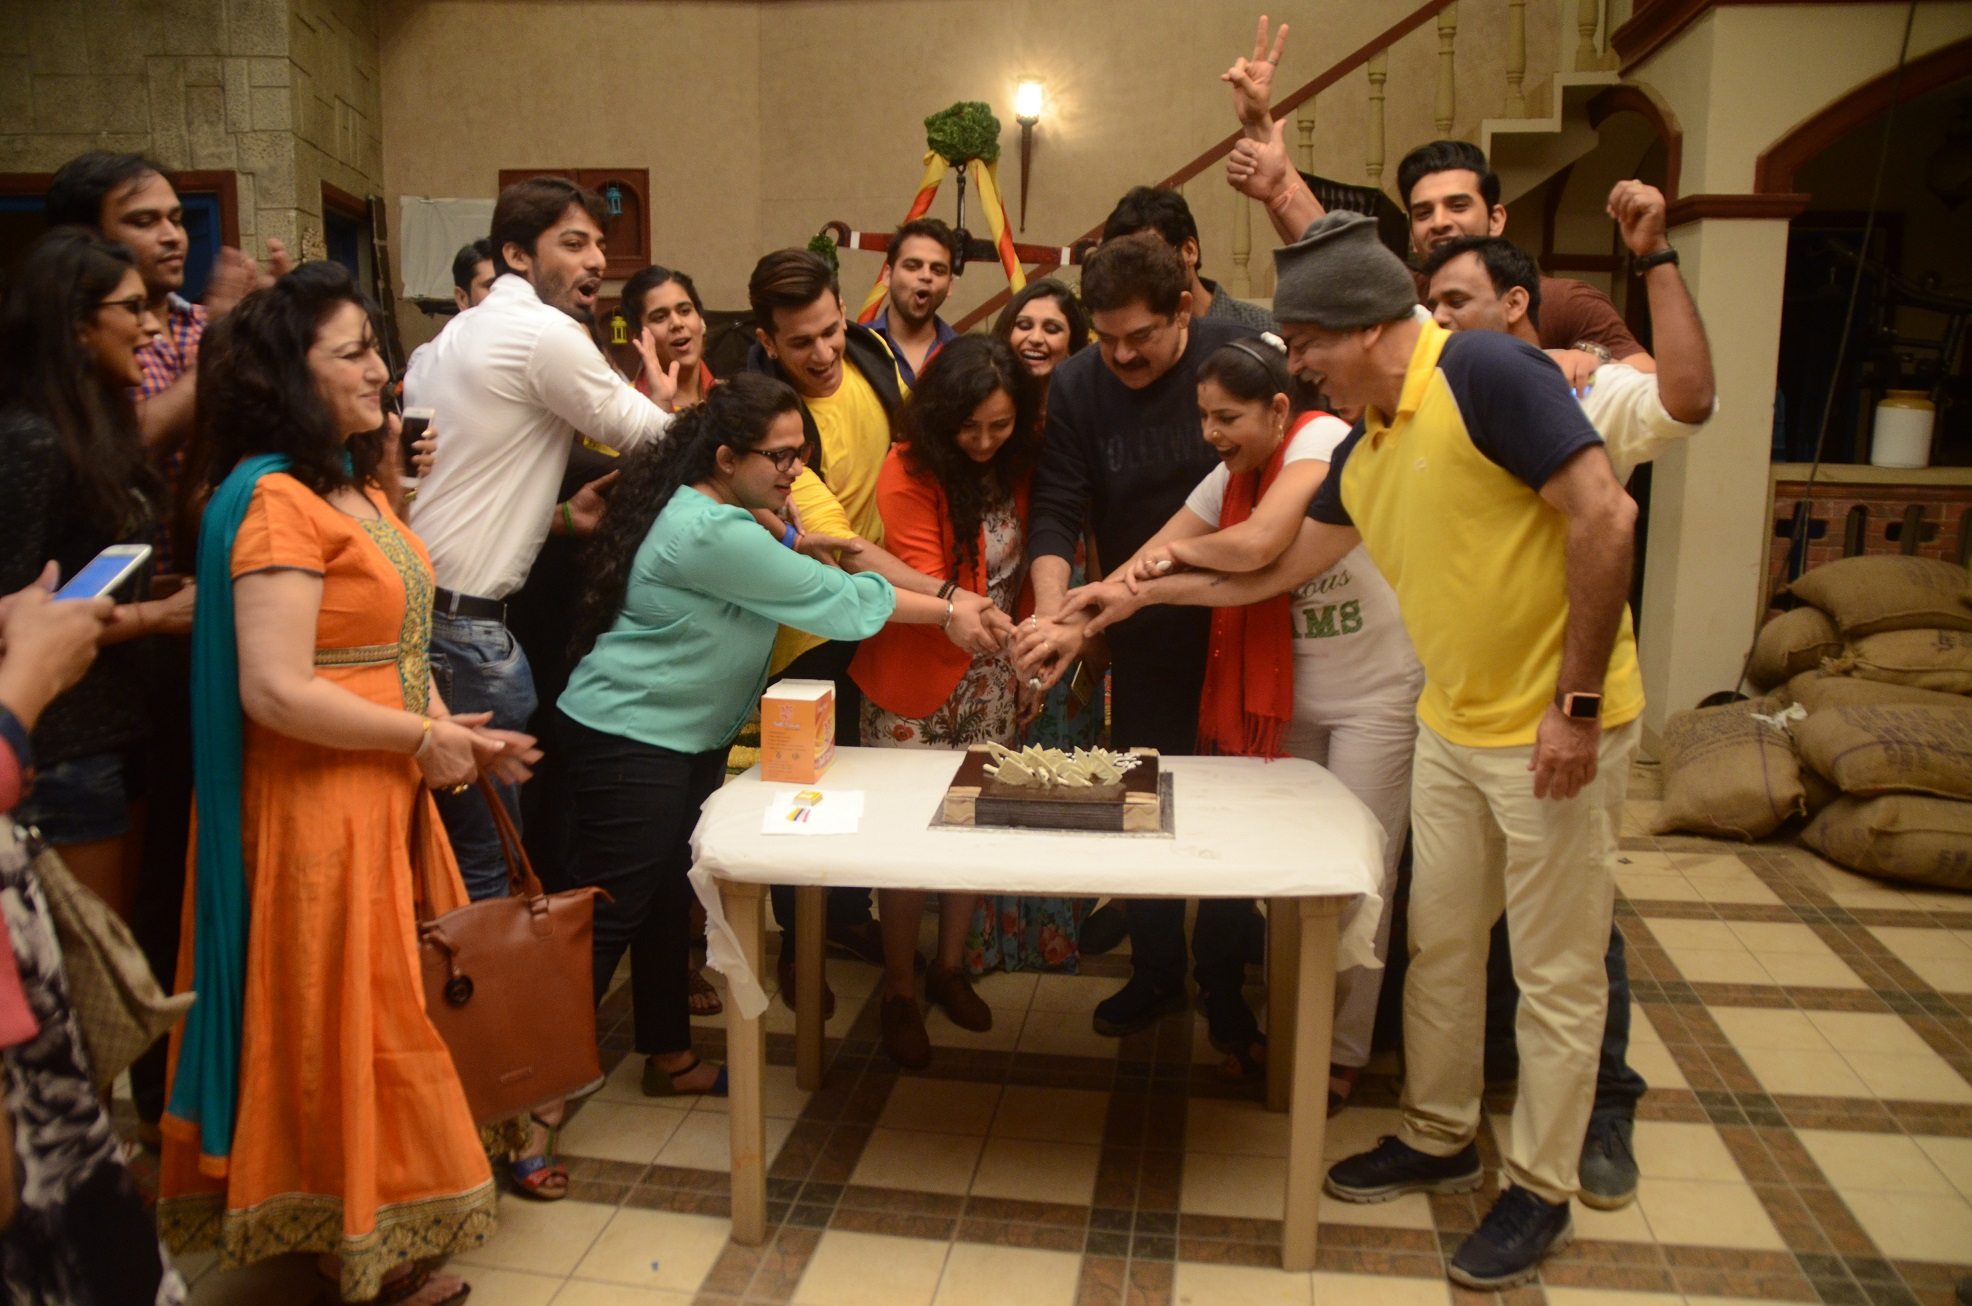 group-cake-cutting